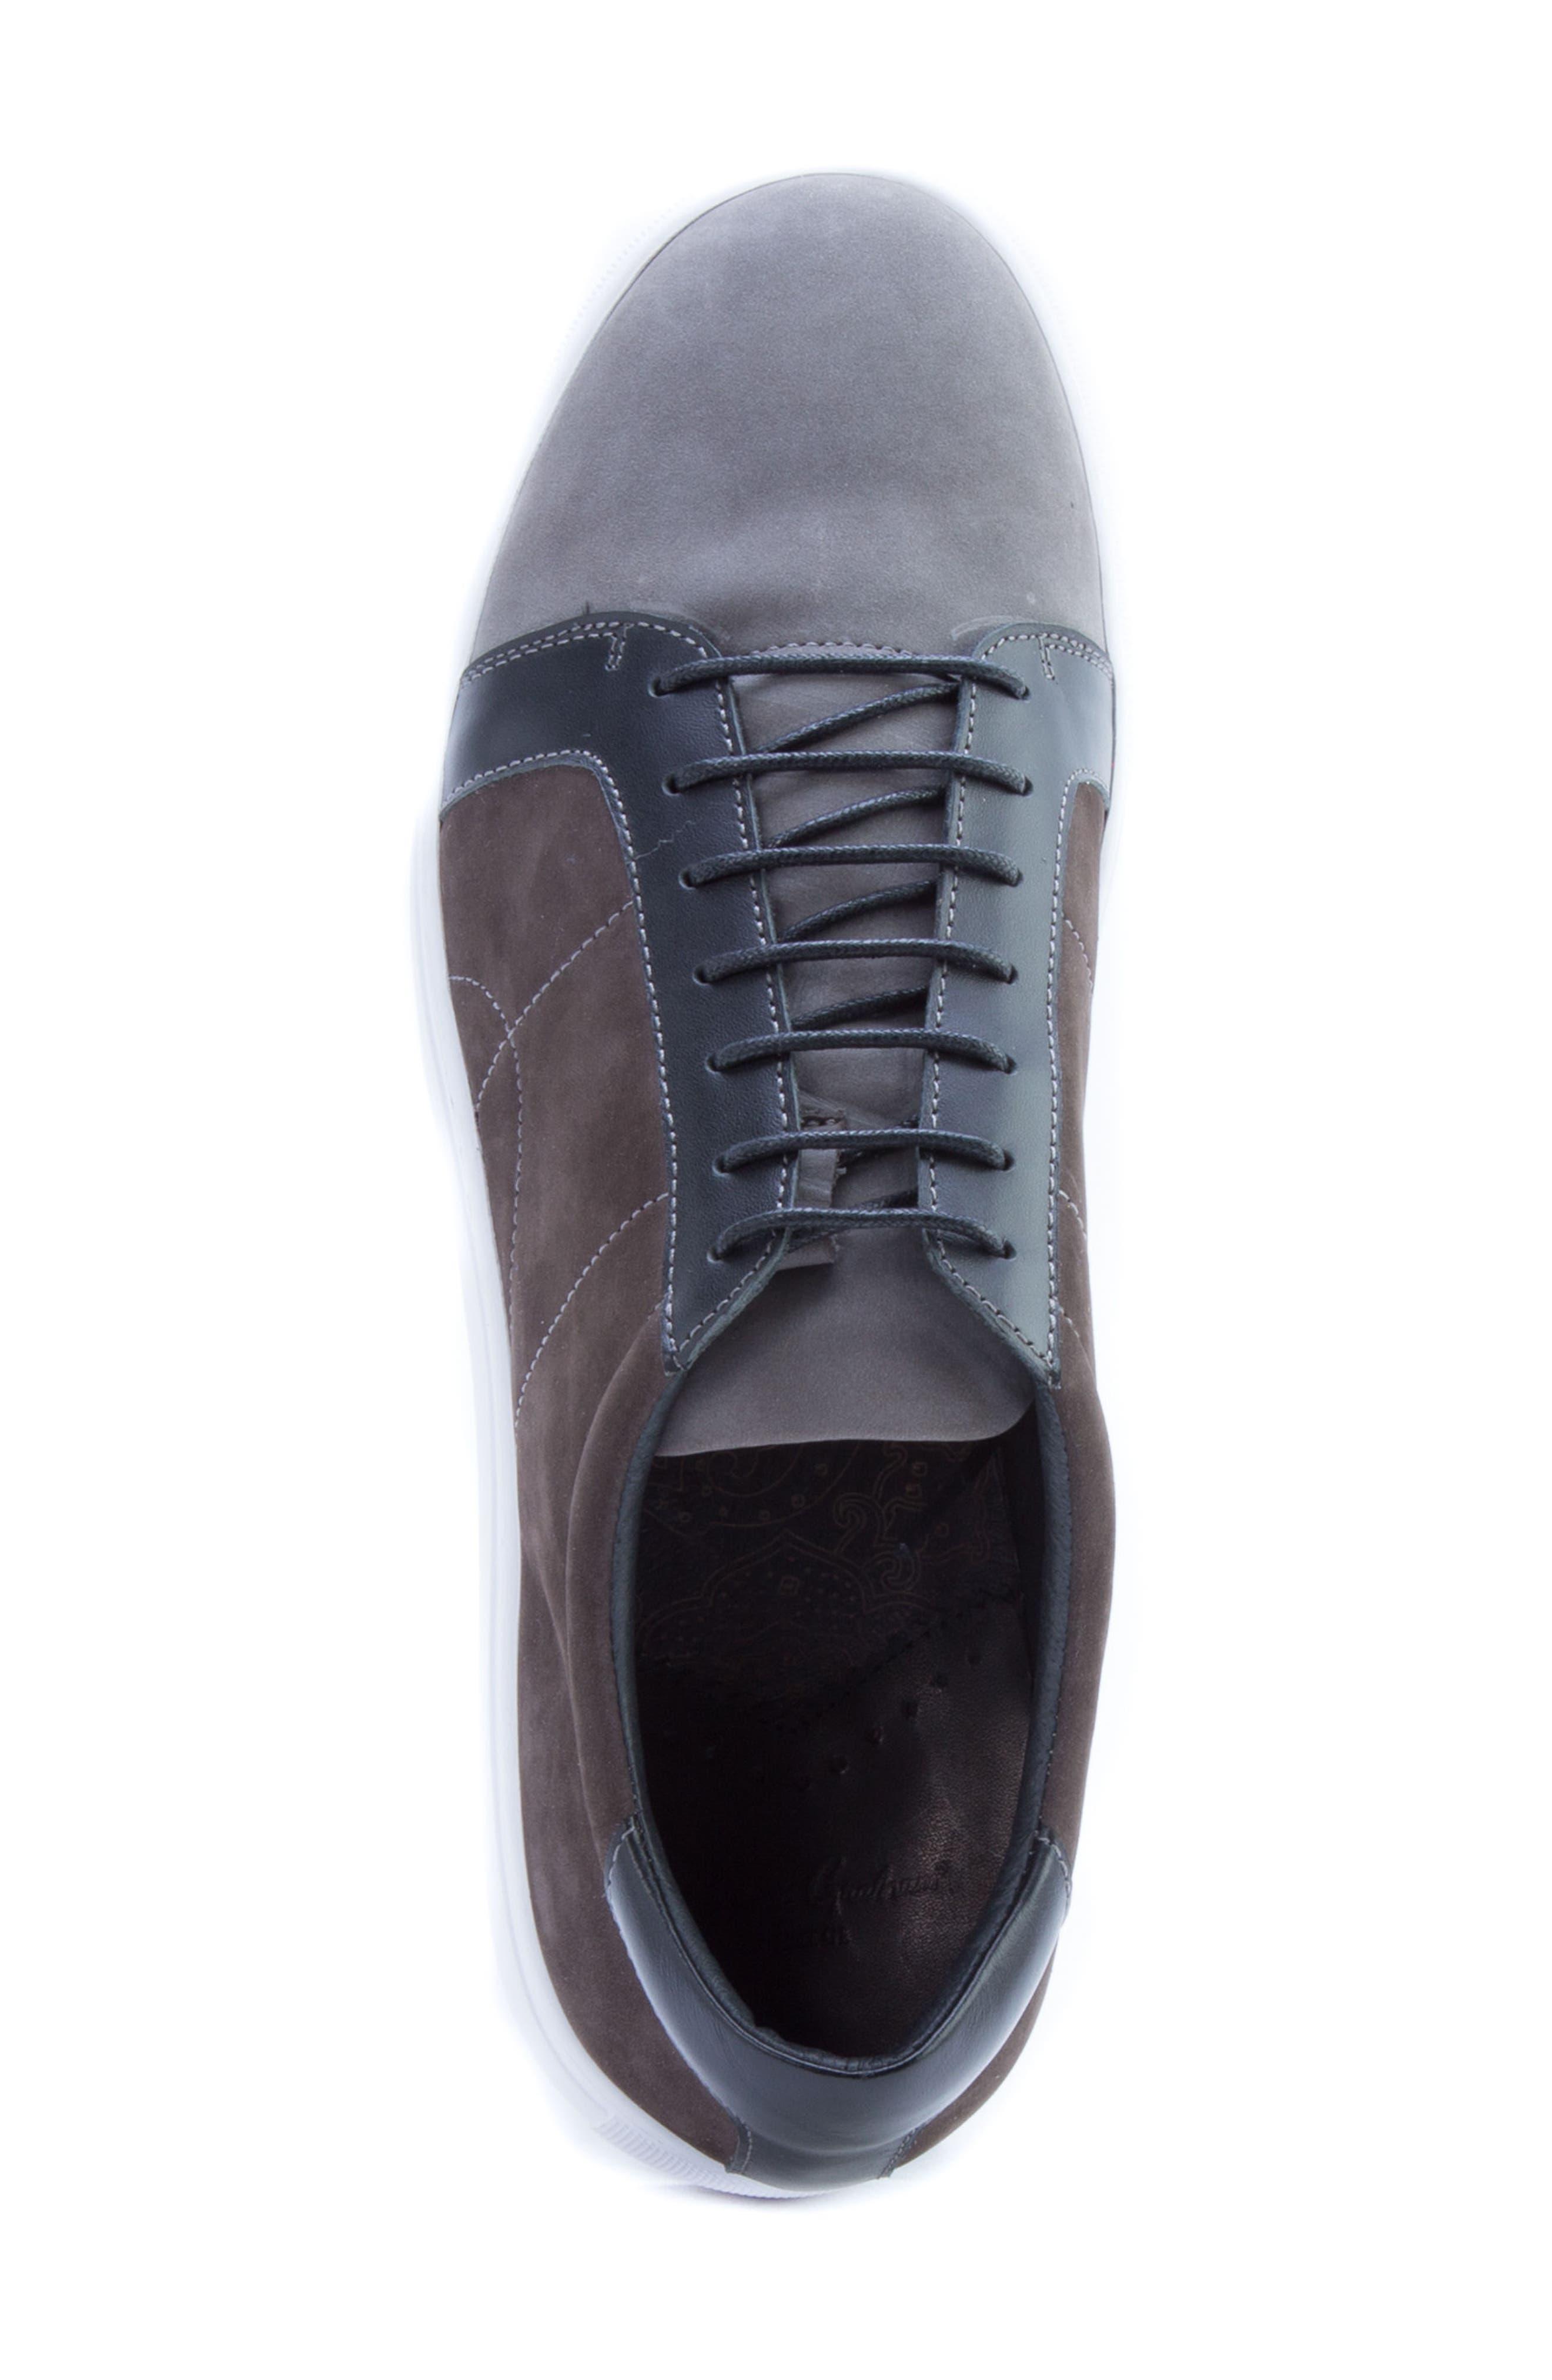 ROBERT GRAHAM, Gonzalo Low Top Sneaker, Alternate thumbnail 5, color, GREY SUEDE